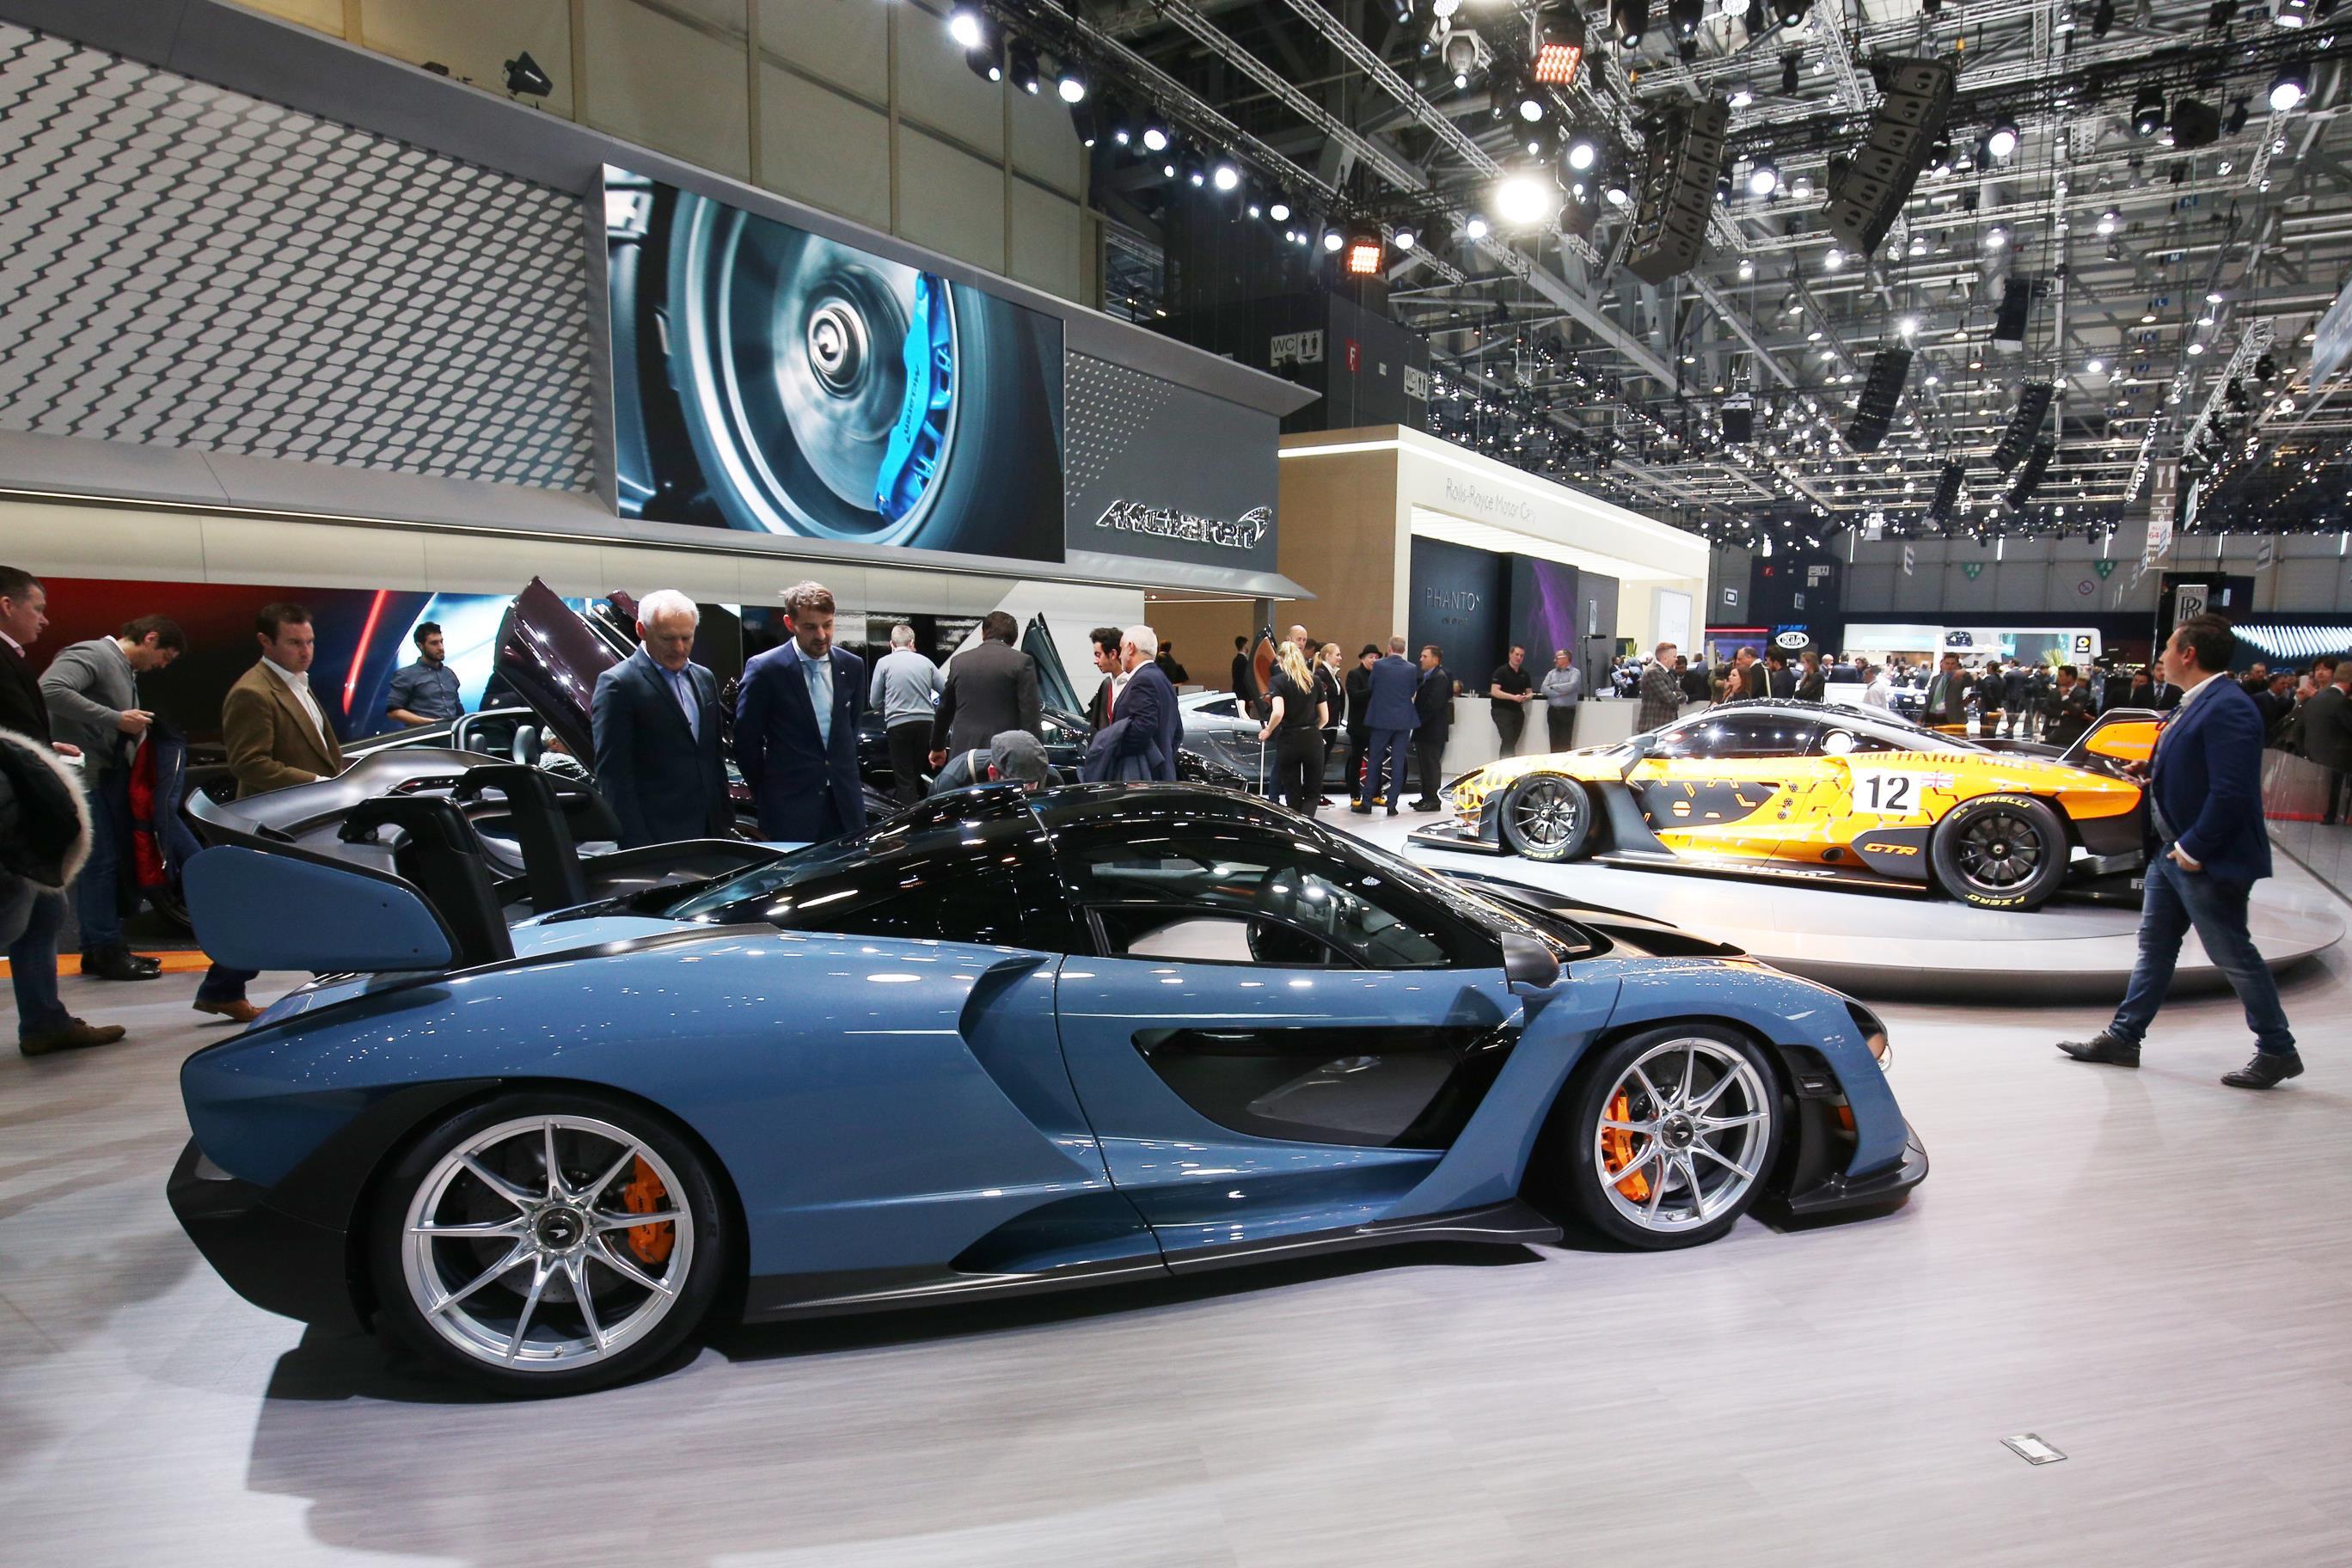 Geneva Motor Show 2018 Mega Gallery Part 1 (277)